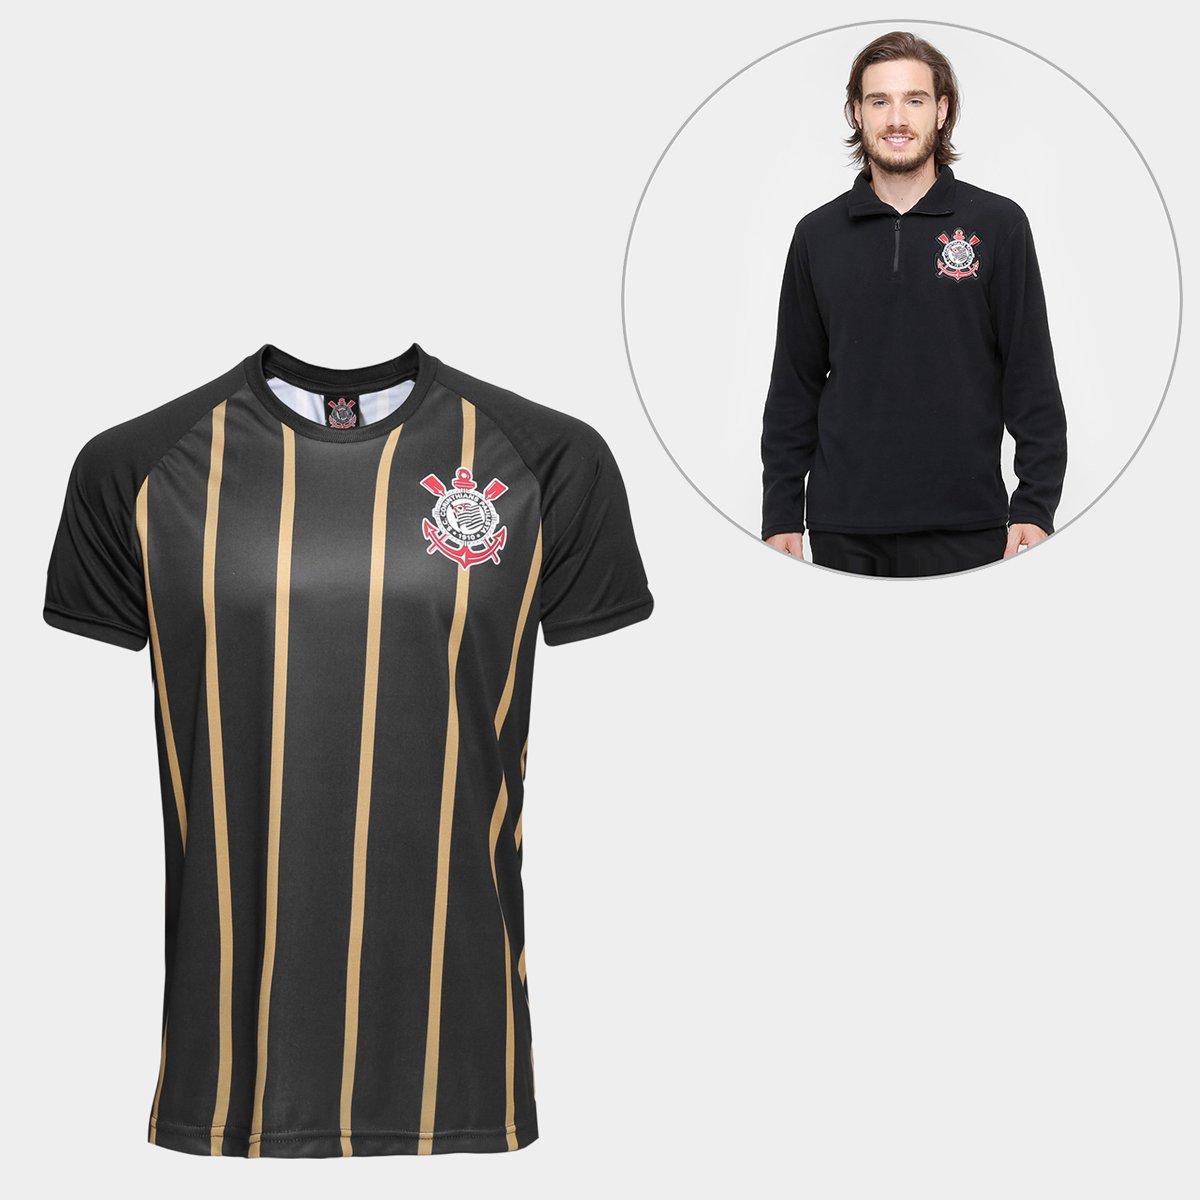 Kit Camisa Corinthians Gold nº10 - Edição Limitada + Blusão Corinthians  Polar Fleece Masculino ... 75ed9b9795ffd